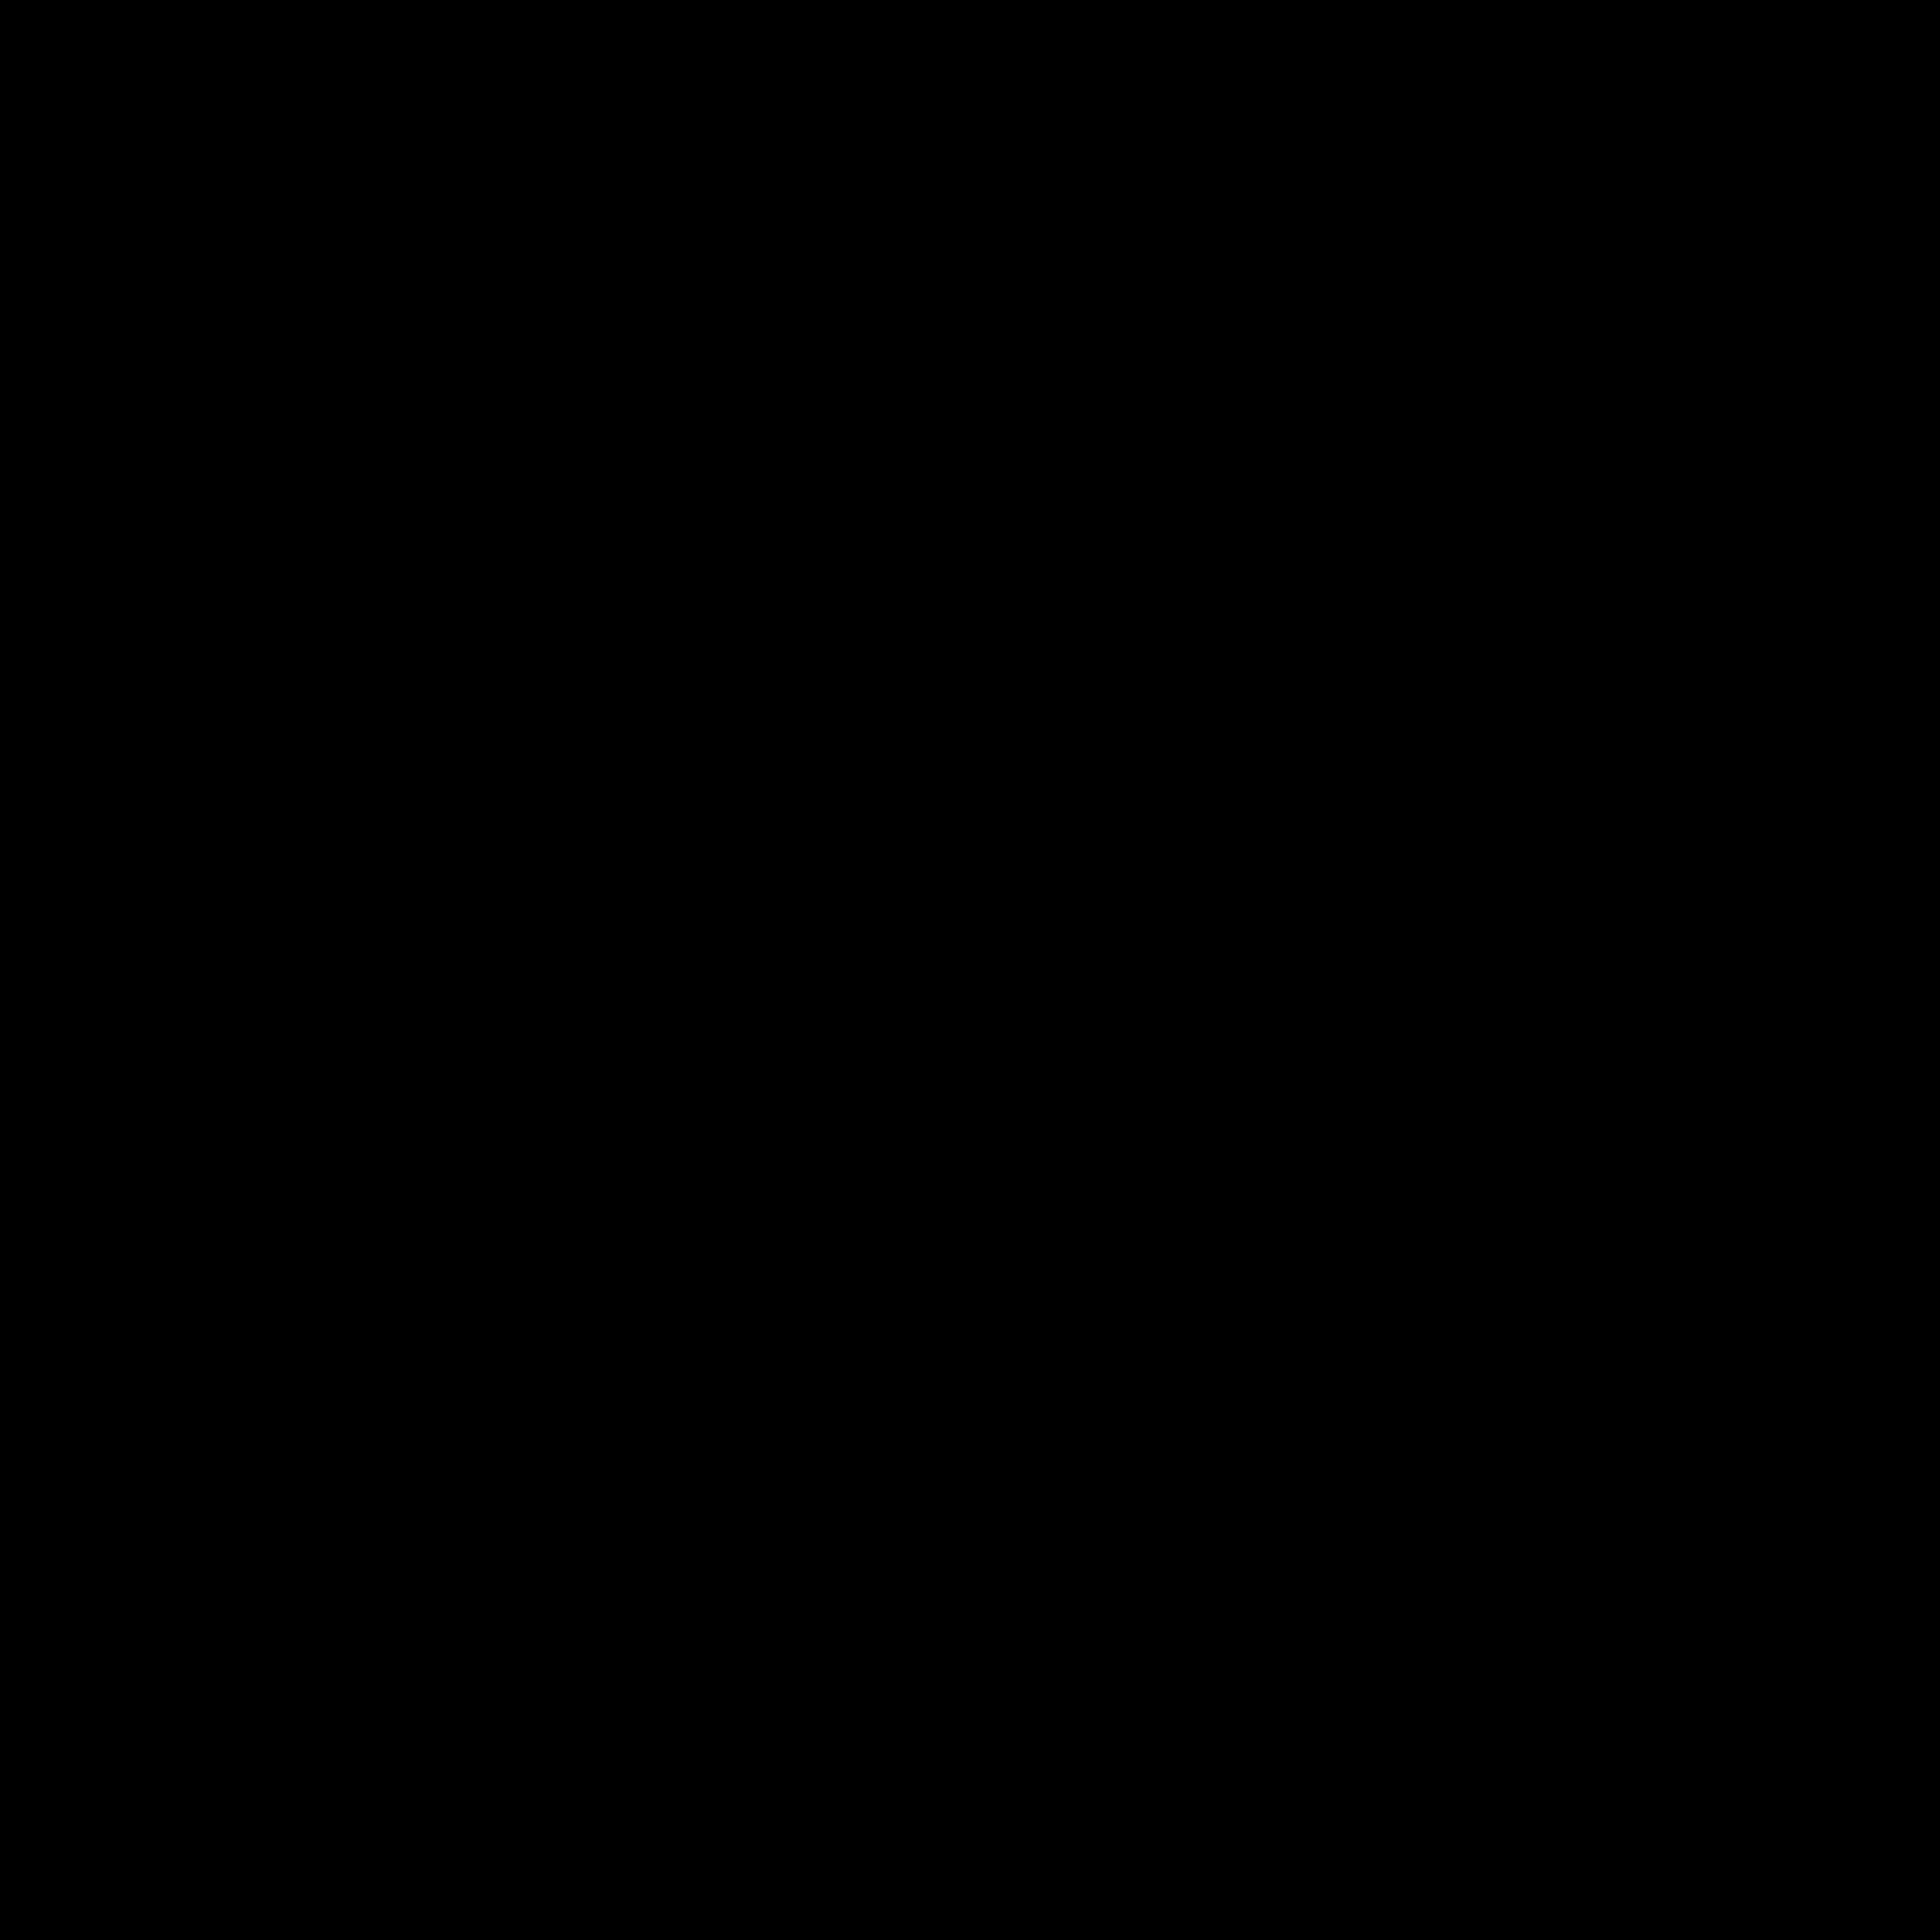 2000x2000 Filewoman Silhouette 53.svg